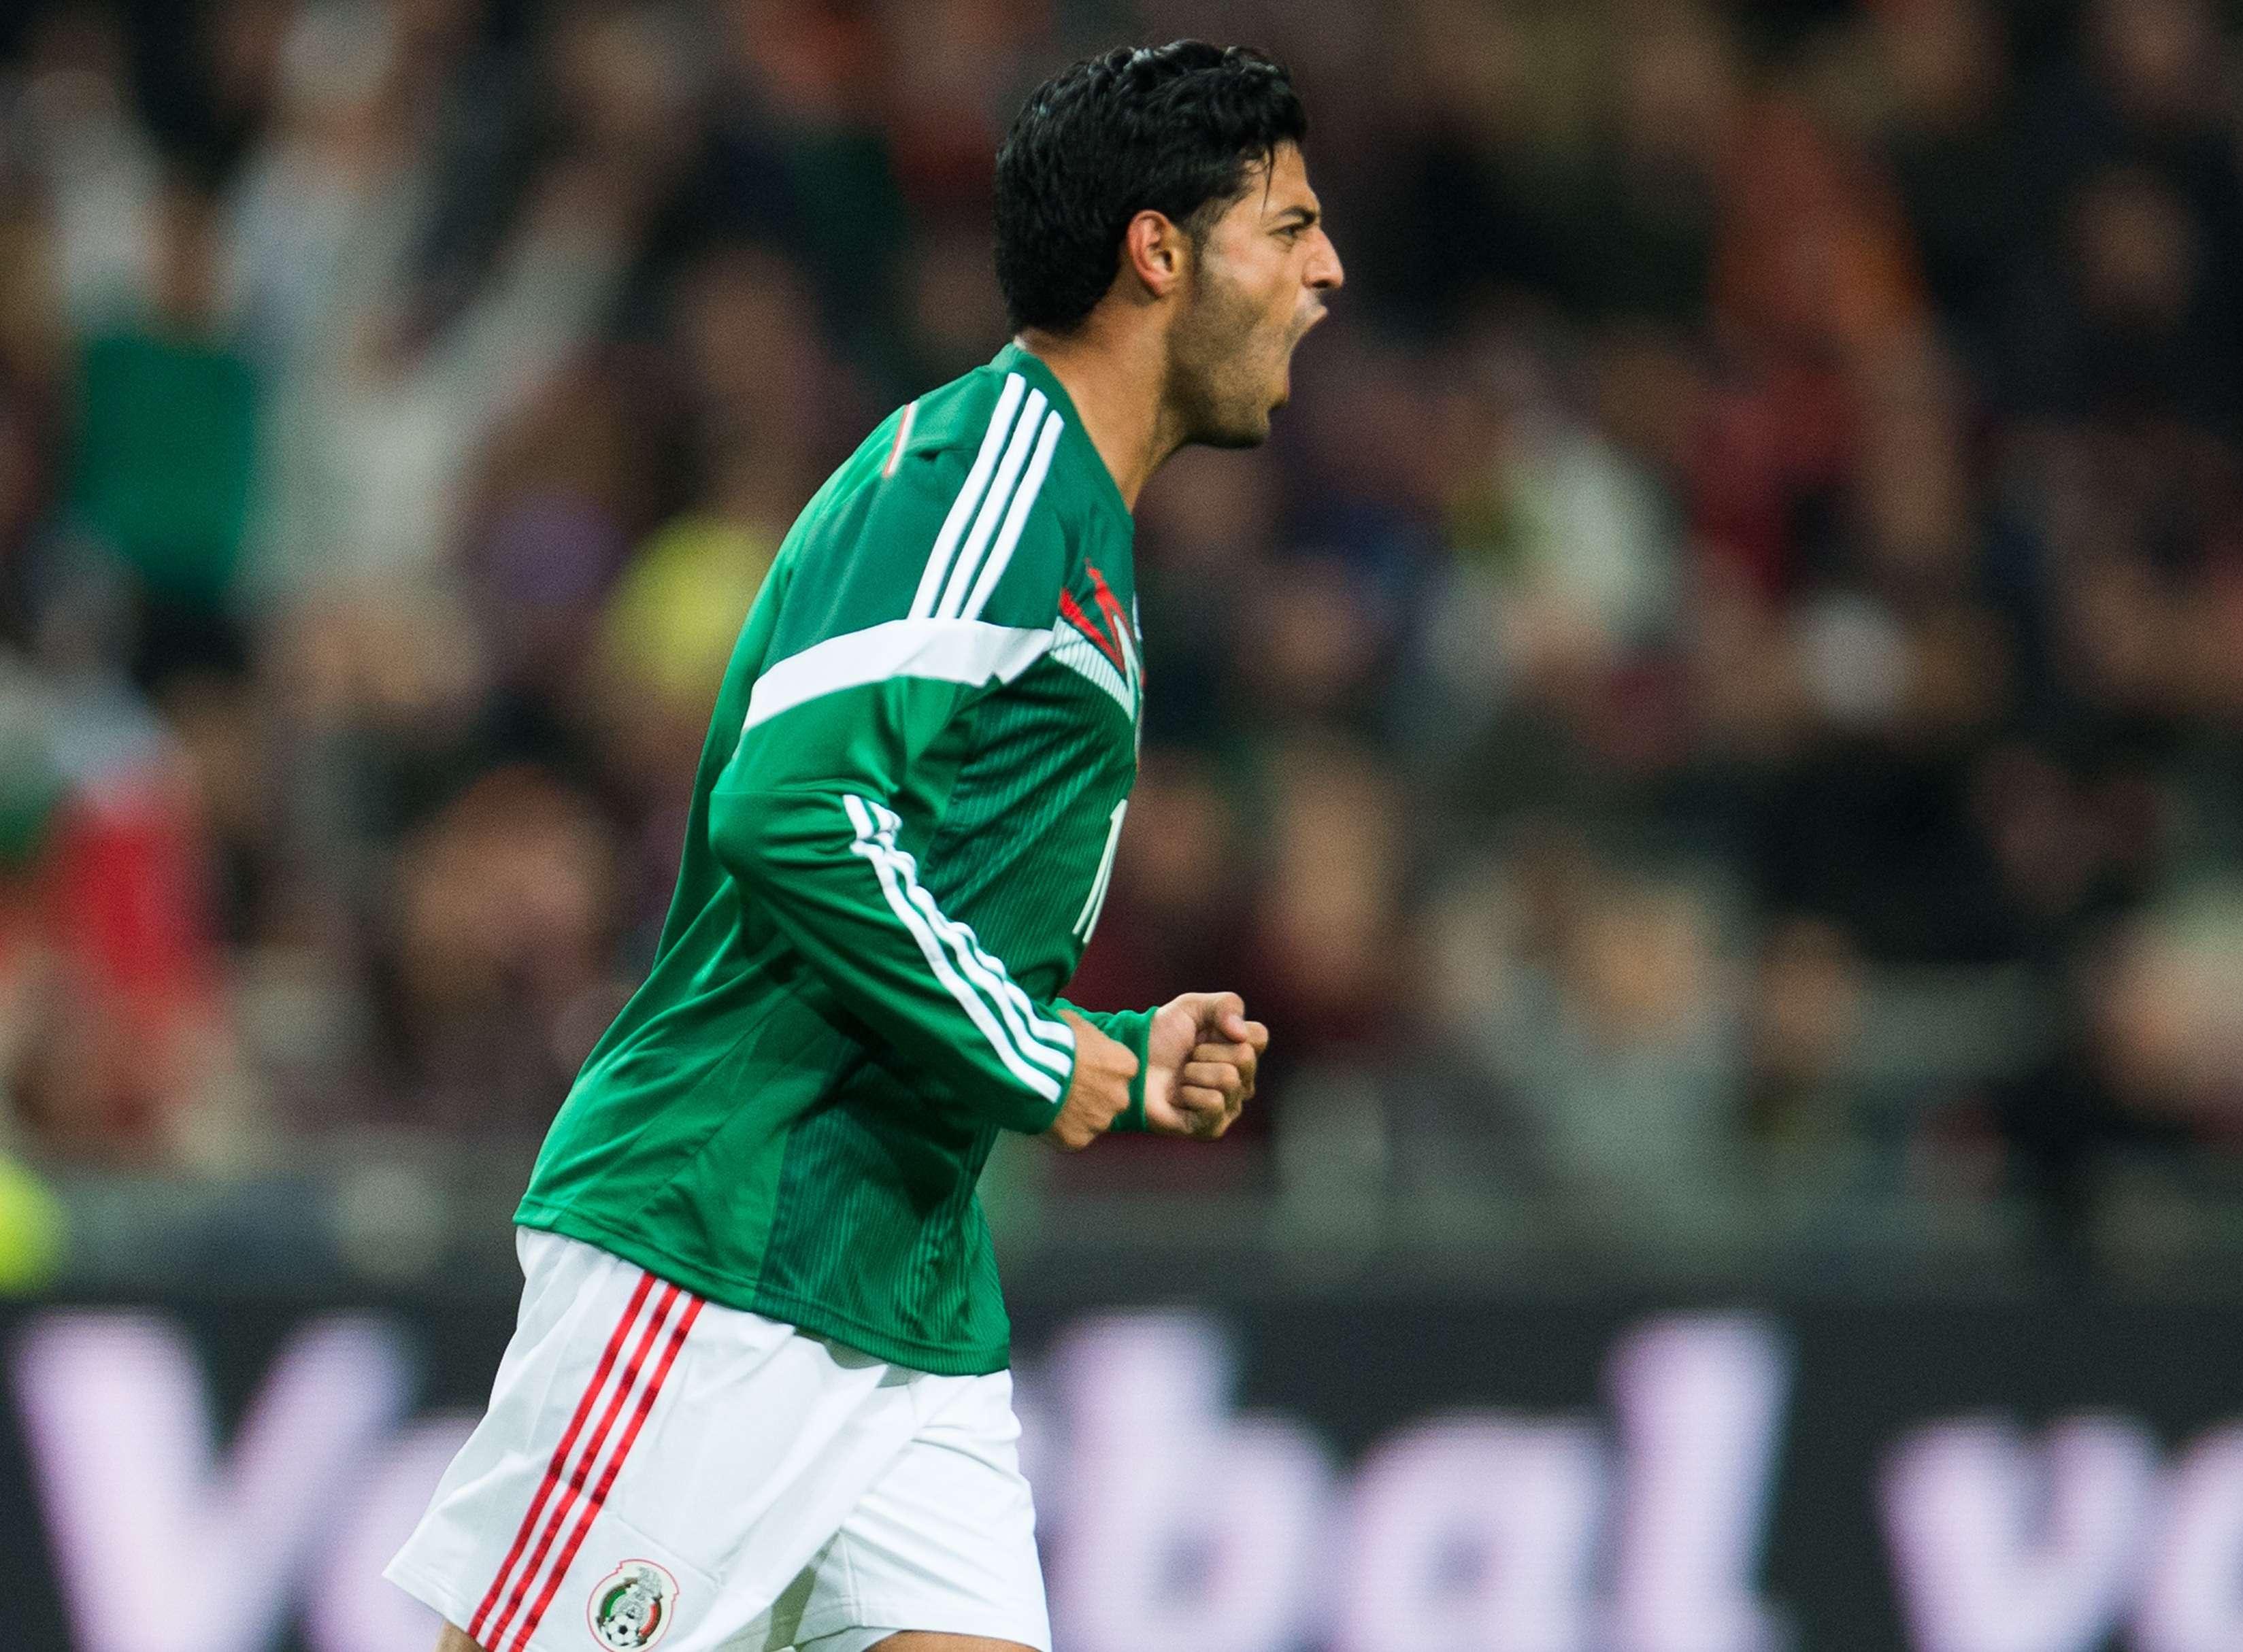 Carlos Vela celebra su segundo gol en el triunfo de México 3-2 sobre Holanda. Foto: Mexsport